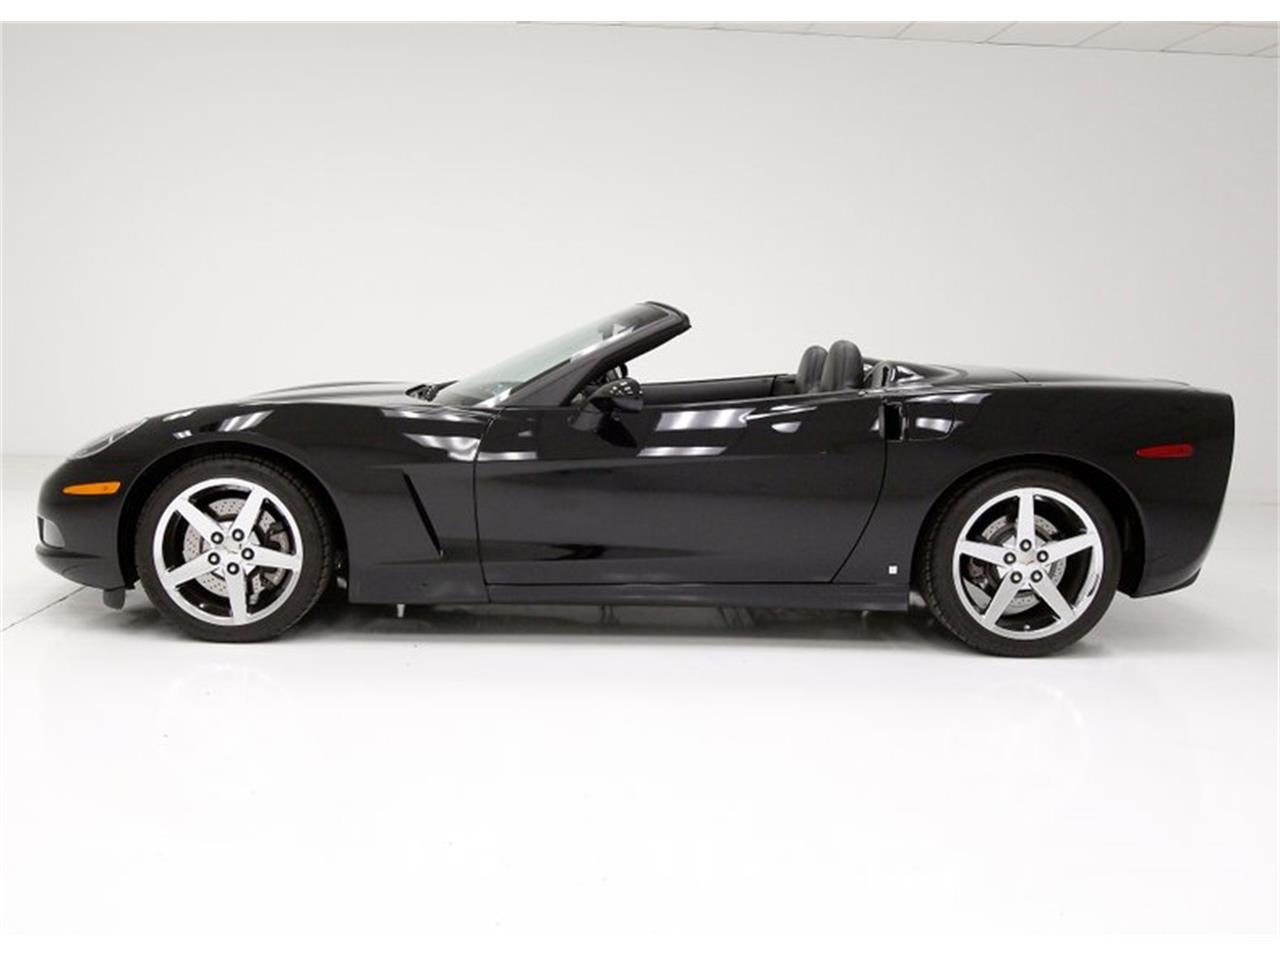 Large Picture of '07 Chevrolet Corvette located in Morgantown Pennsylvania - $29,900.00 - P3IA